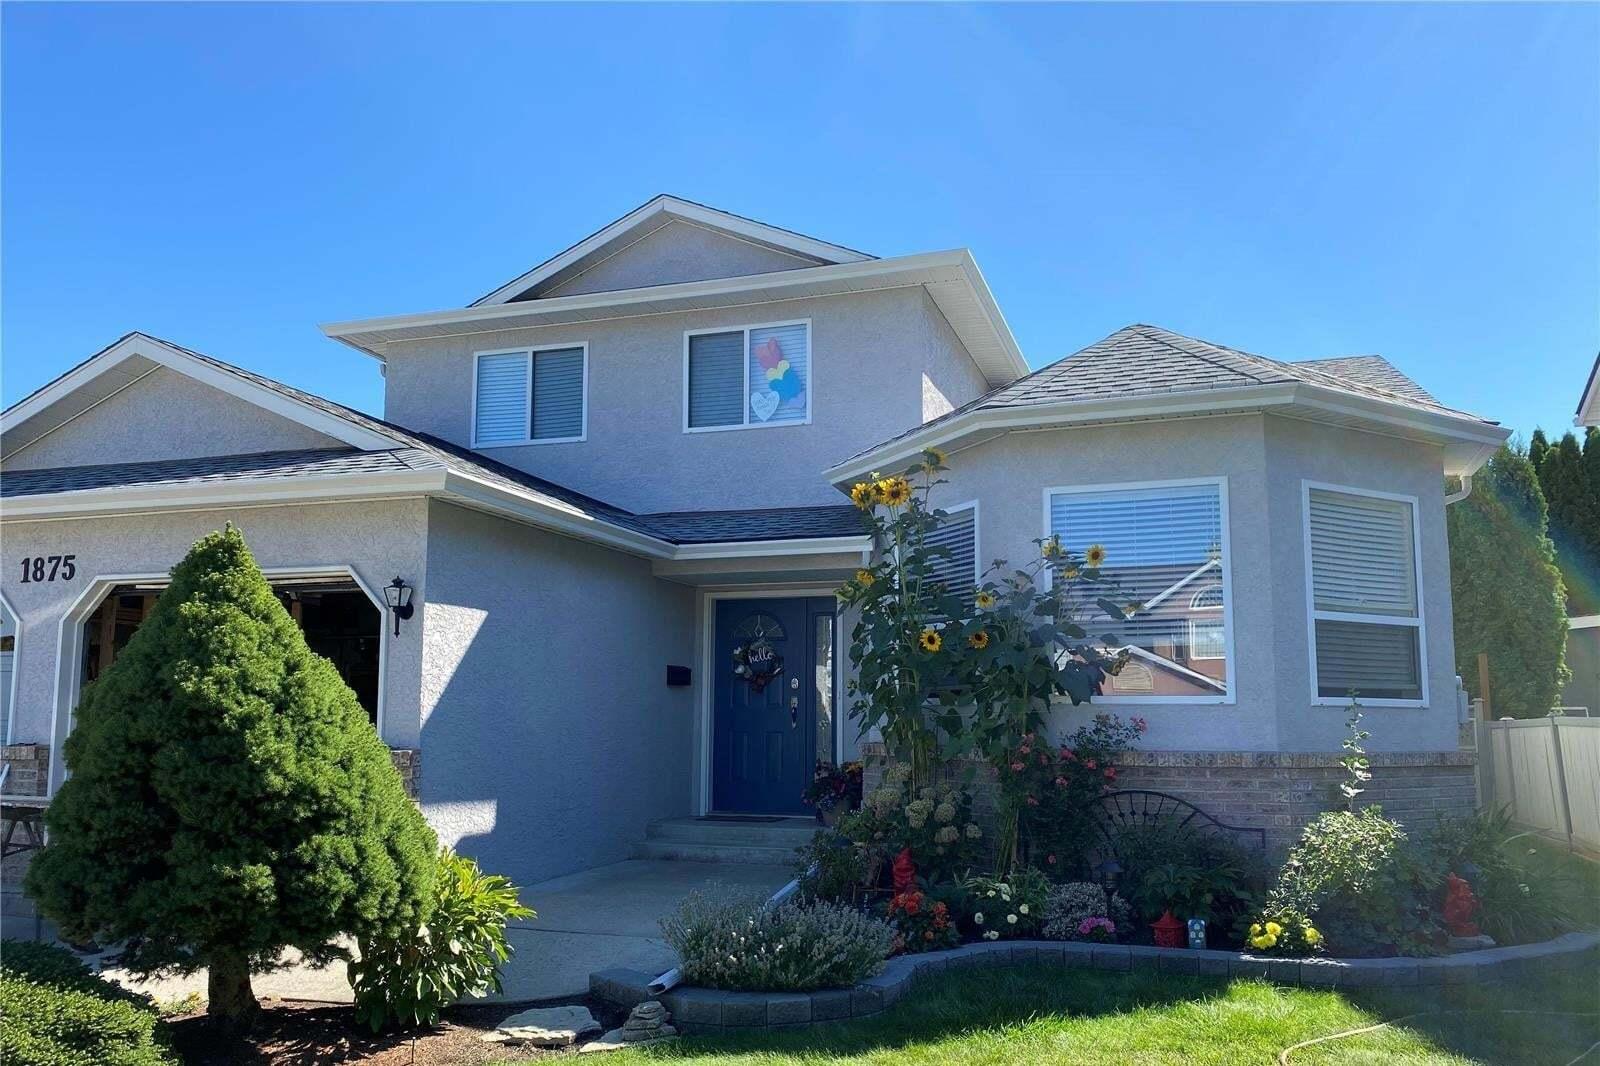 House for sale at 1875 Ranchmont Cres Kelowna British Columbia - MLS: 10214213